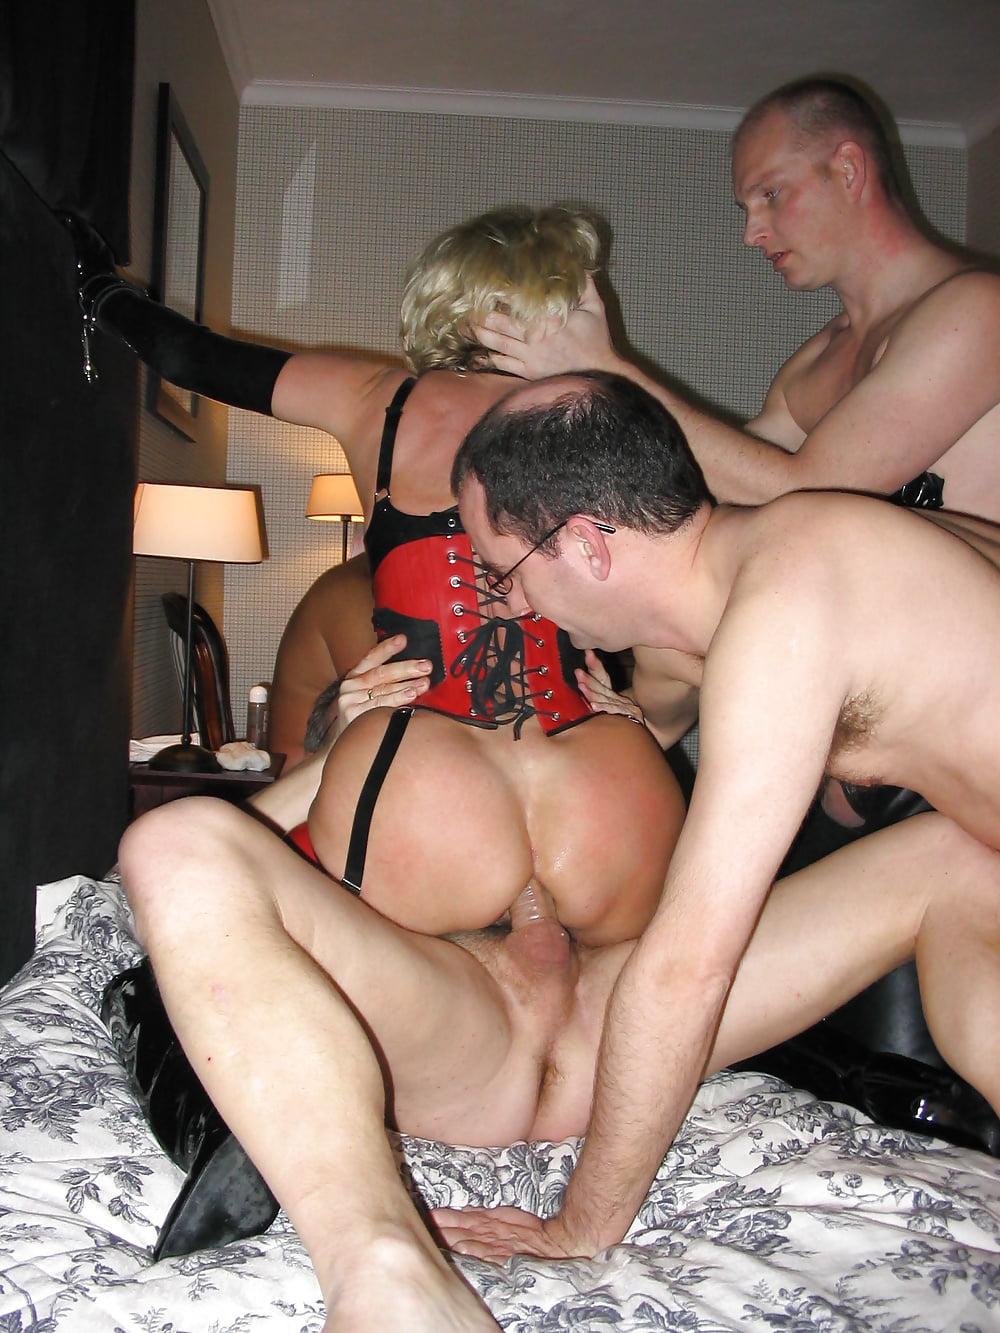 hardcore-slut-wifes-amatuer-first-time-sex-scenes